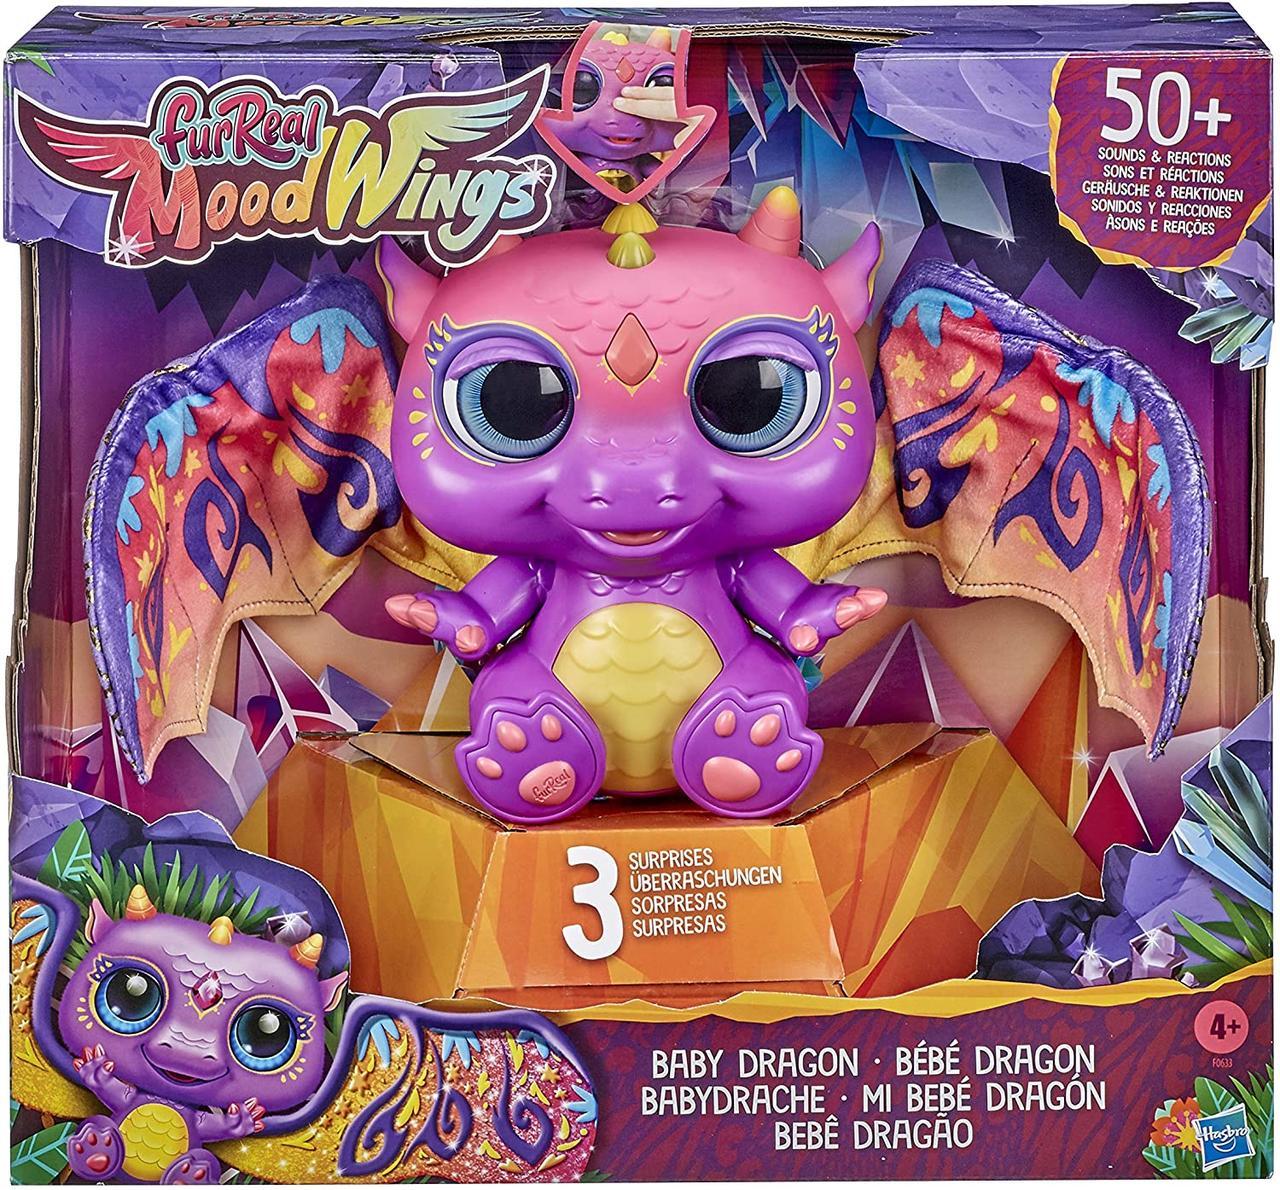 Интерактивная игрушка питомец Малыш Дракон FurReal Moodwings Baby Dragon F0633